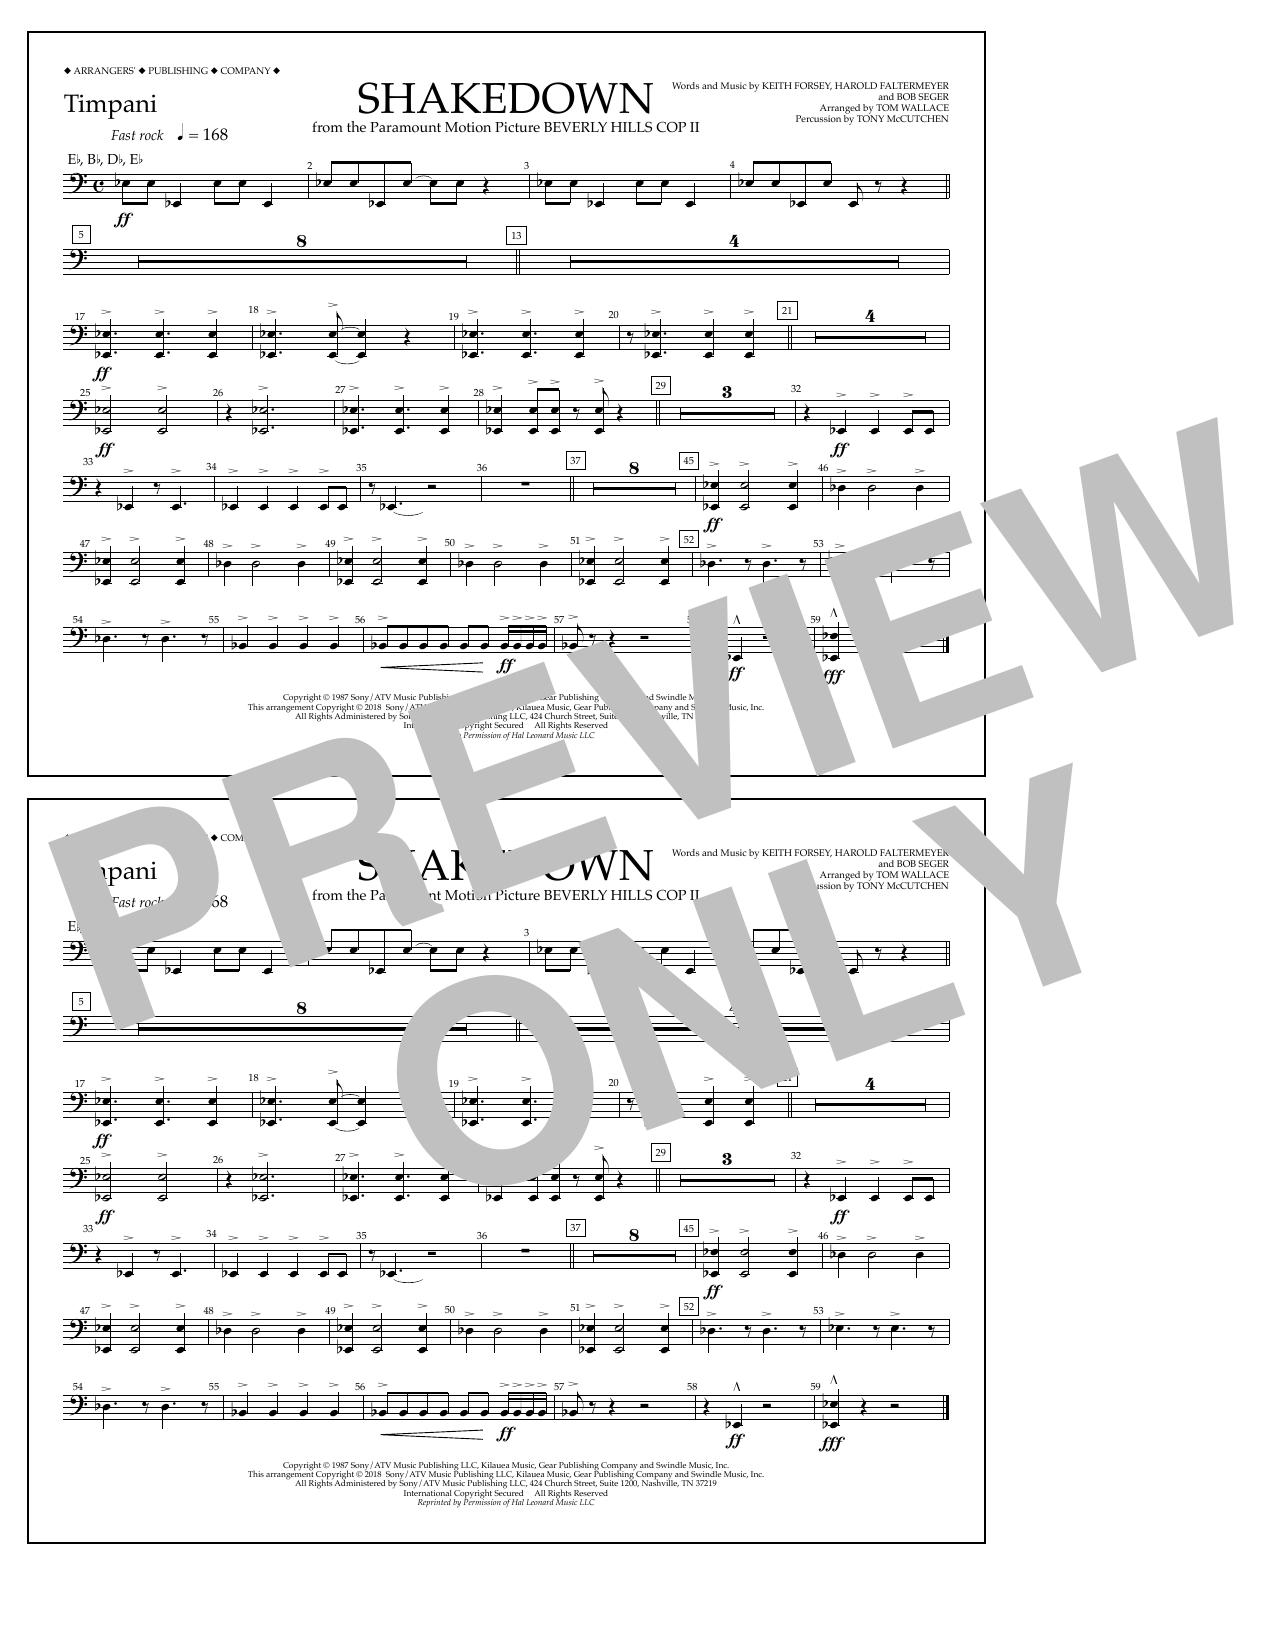 Tom Wallace Shakedown - Timpani sheet music notes and chords. Download Printable PDF.